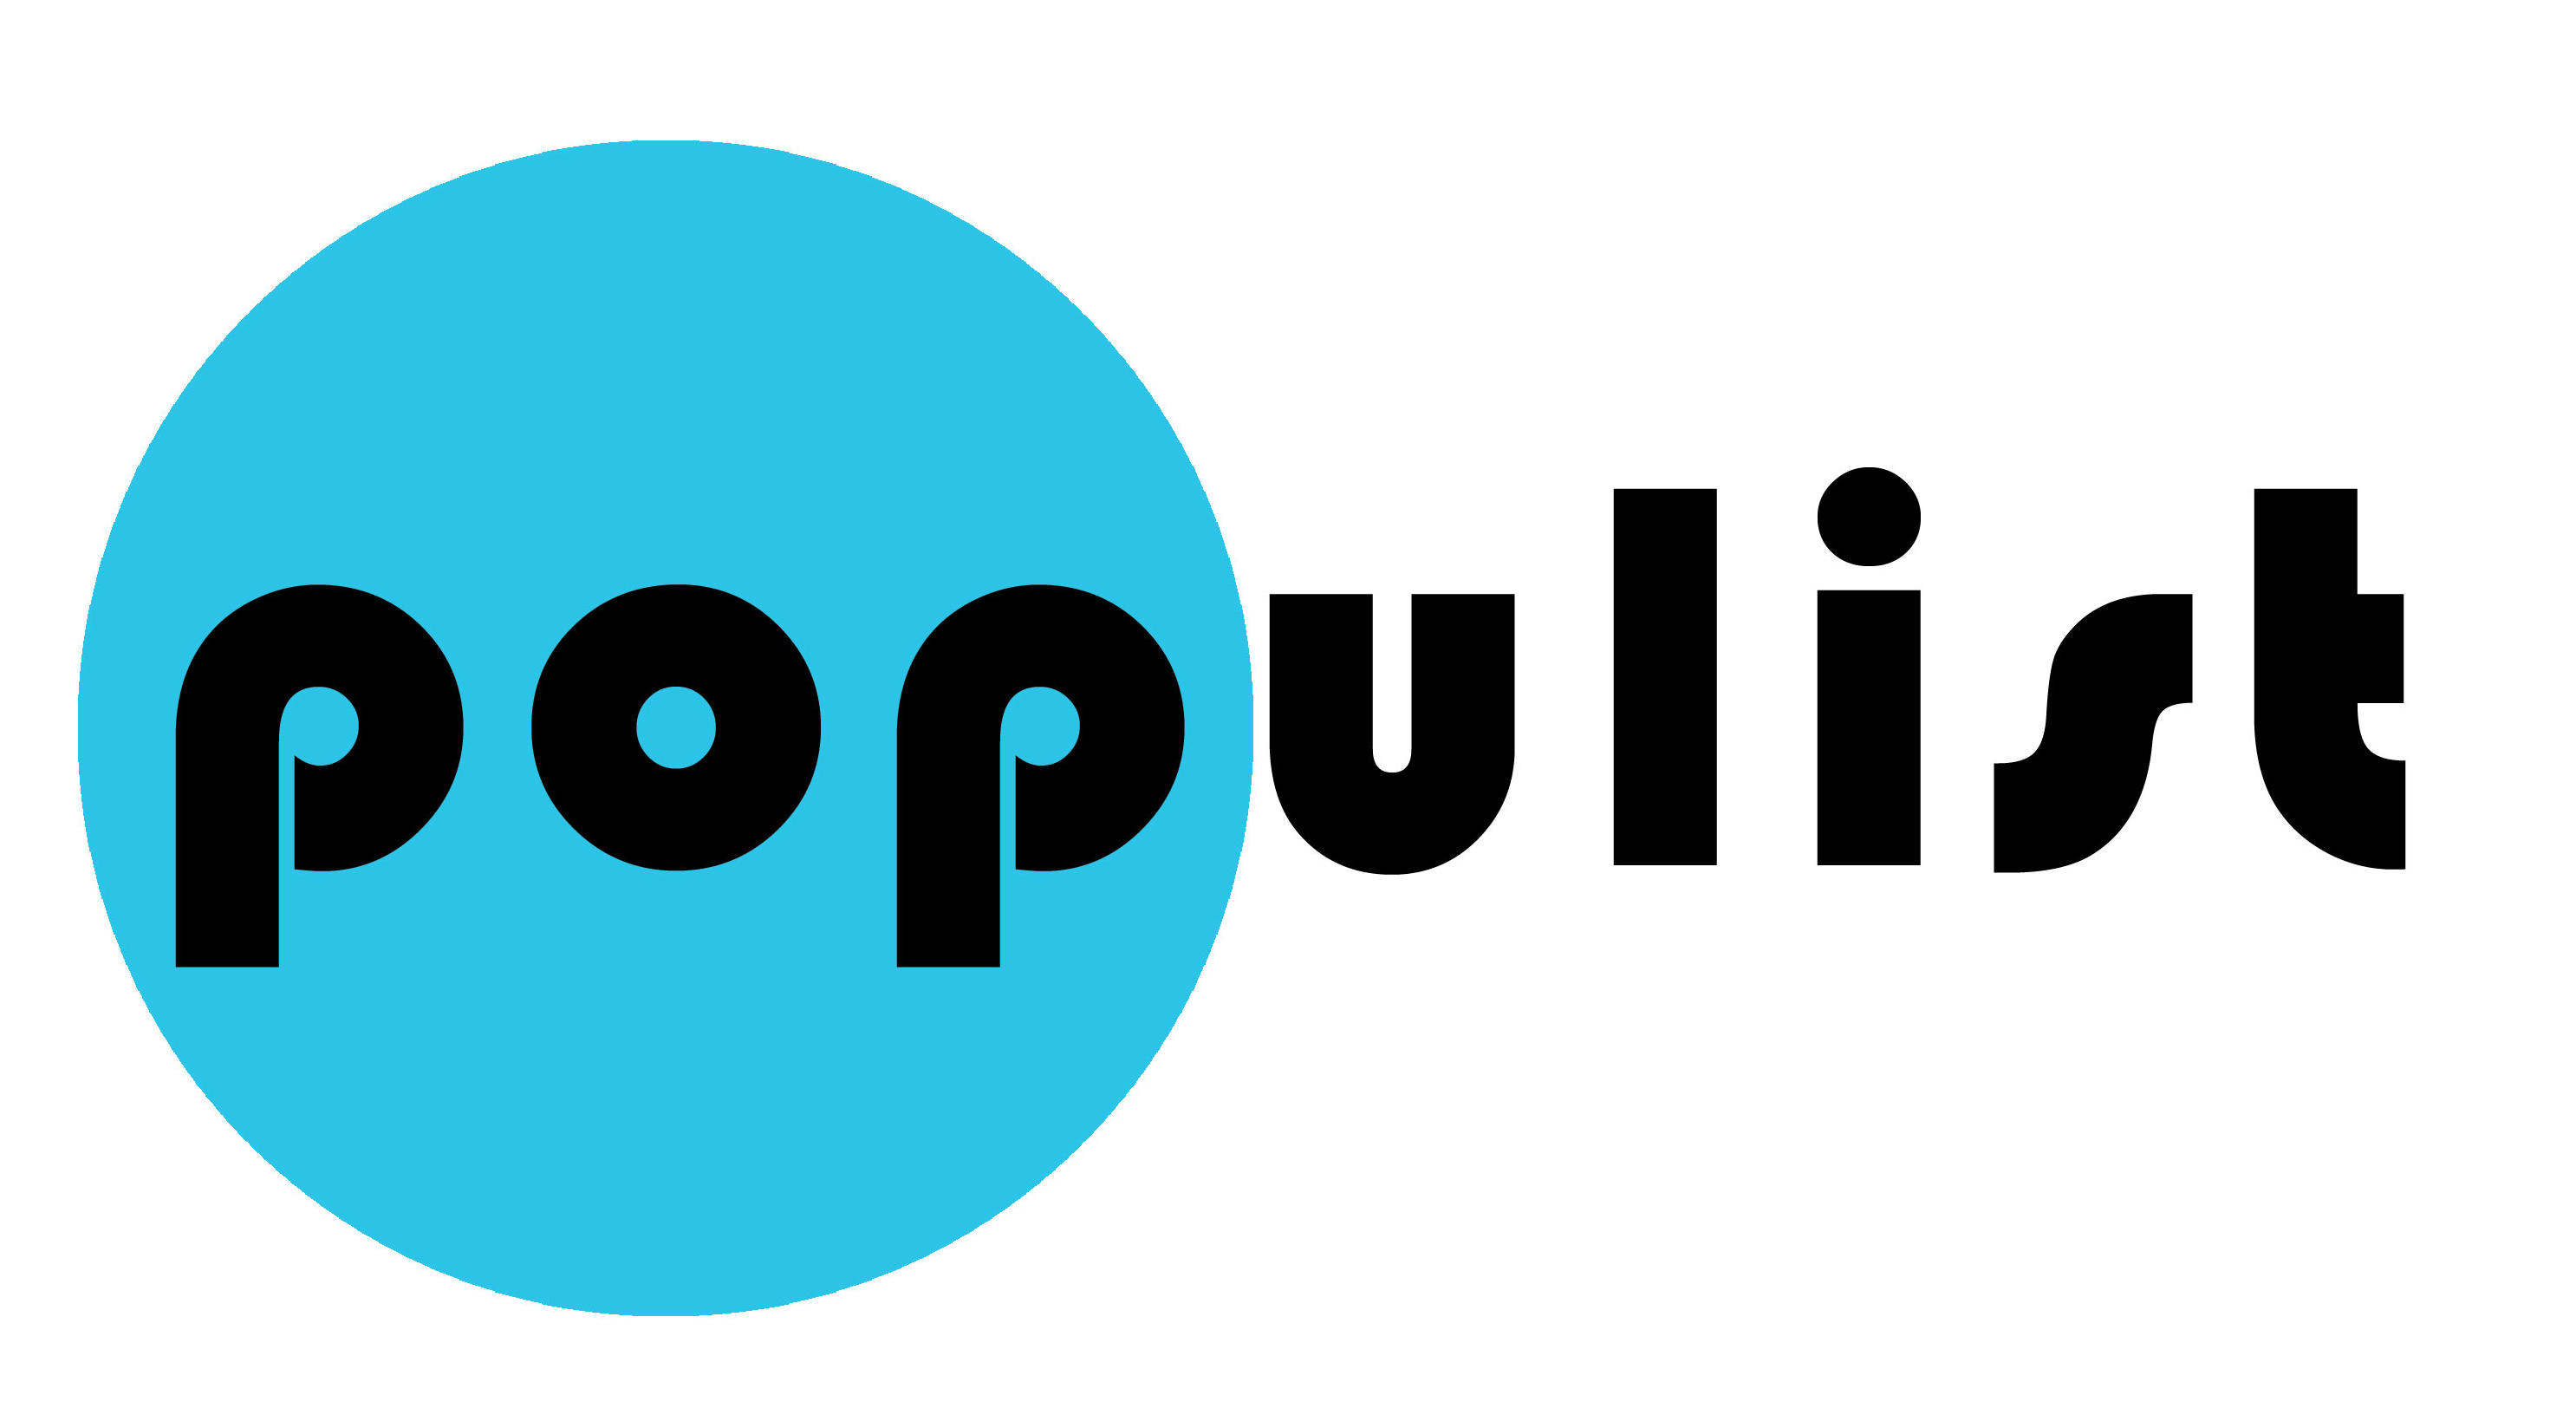 populist-2